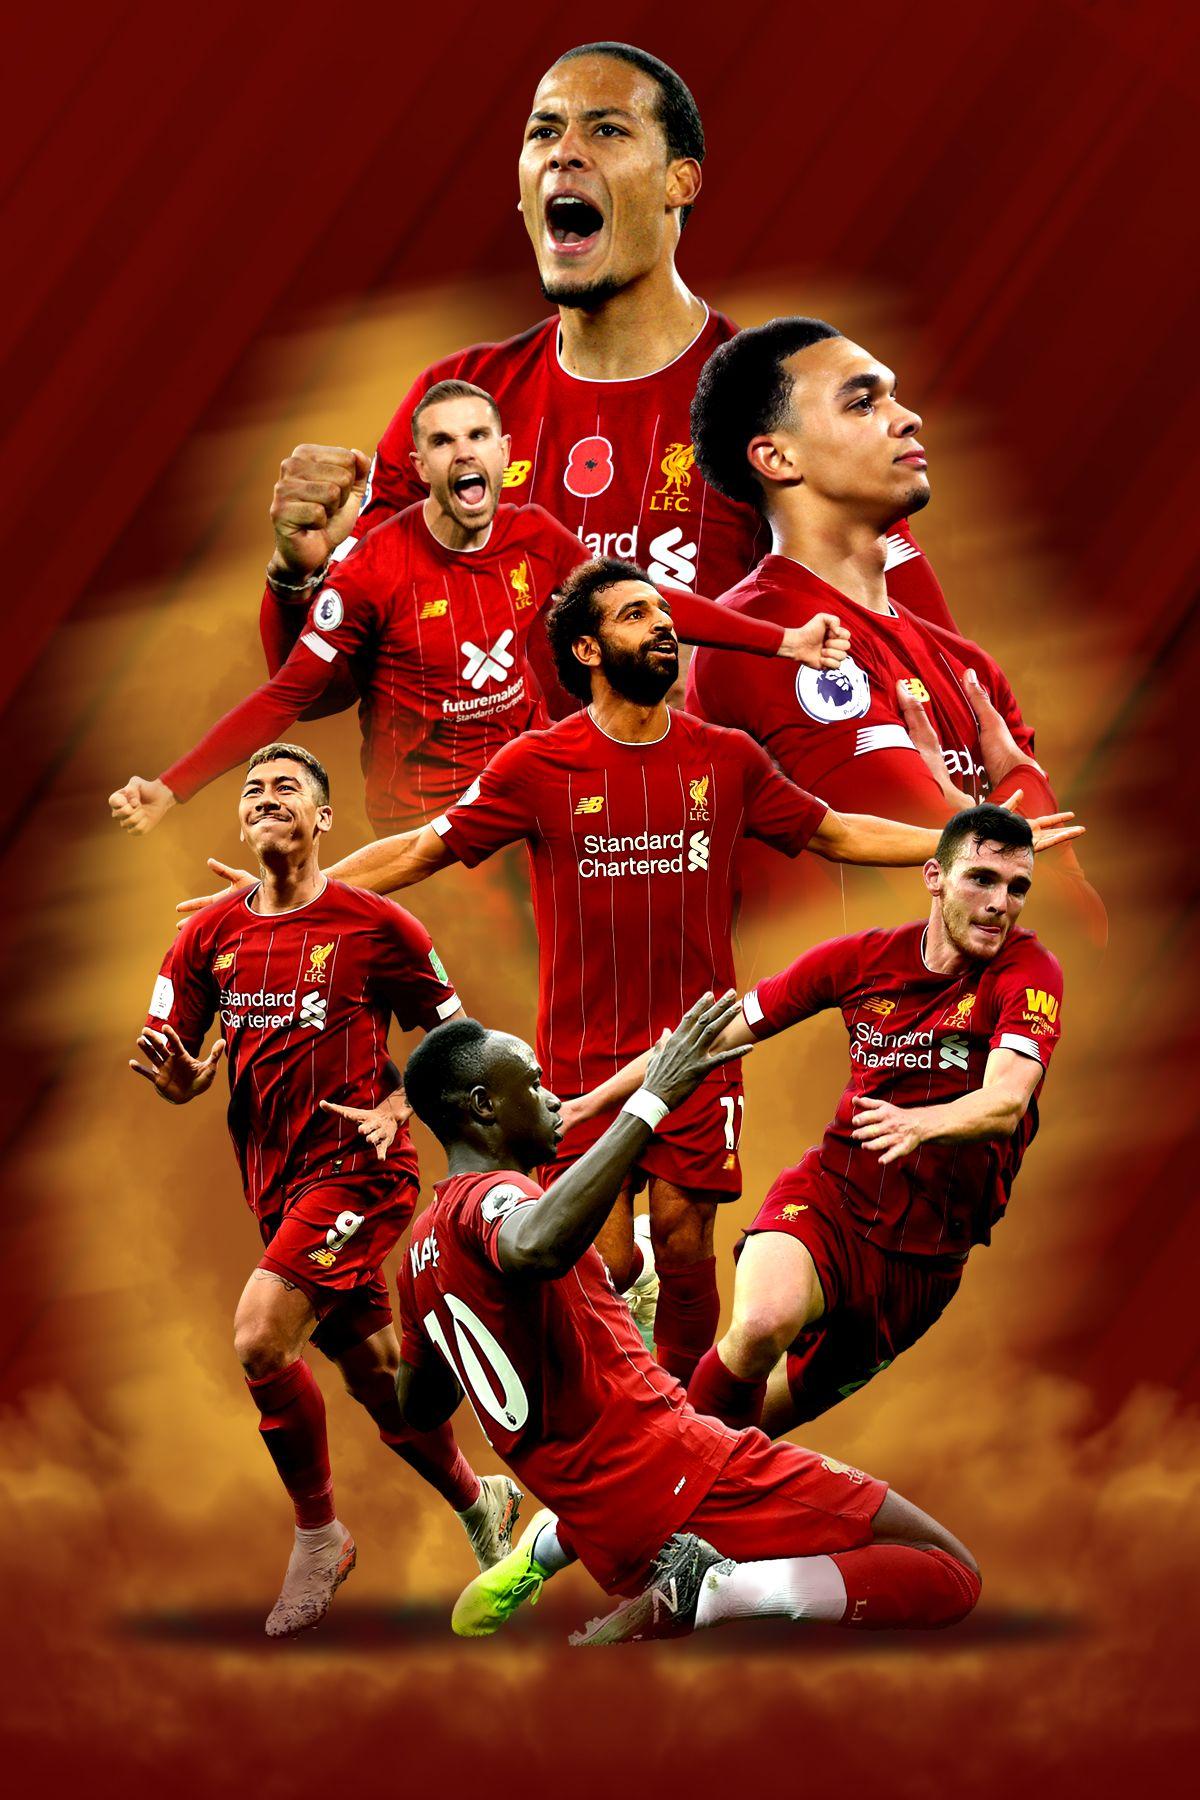 Pin On Premier League